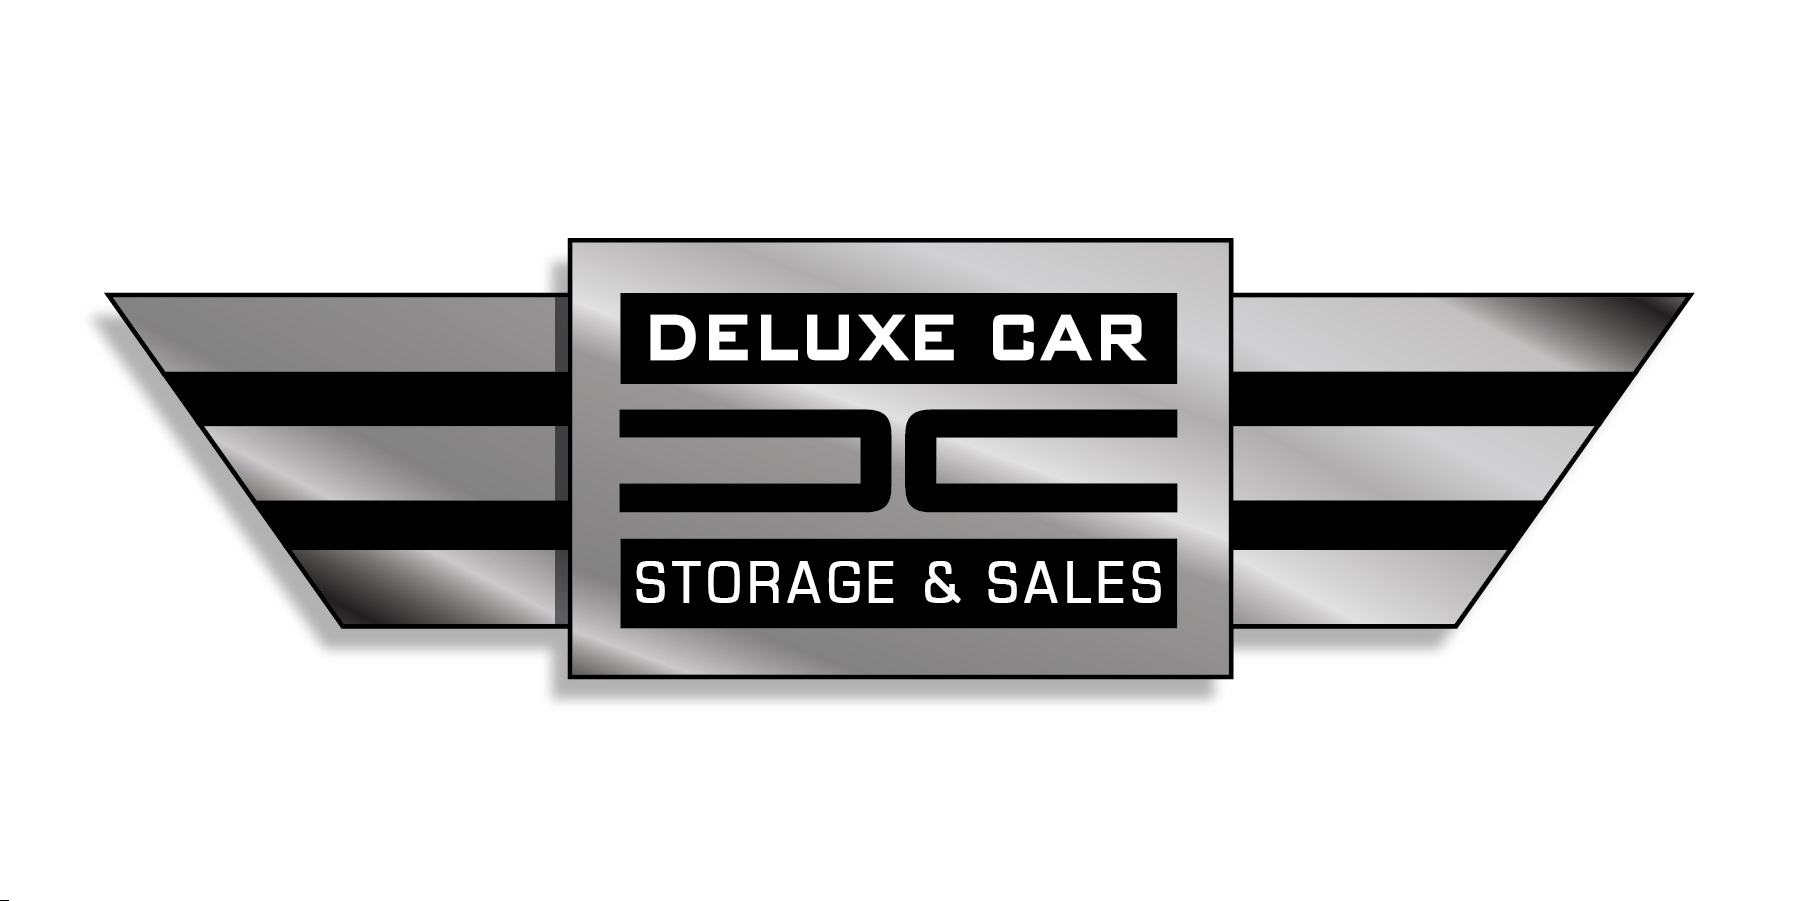 Vehicle Storage New York Deluxe Car Storage Amp Sales